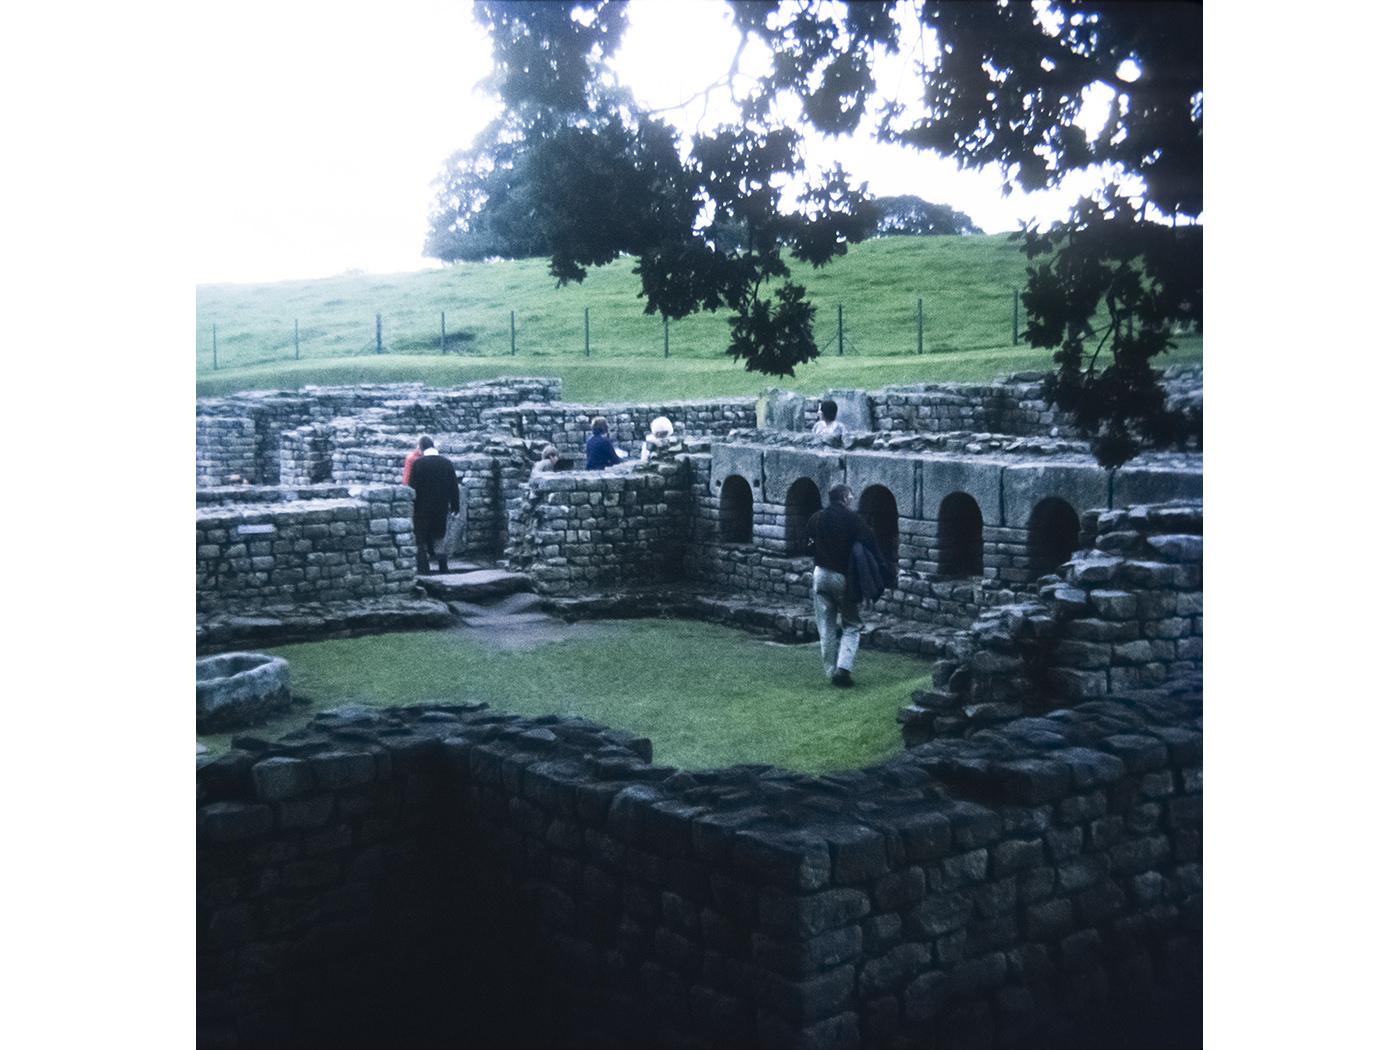 hadrians-wall-site-02.jpg